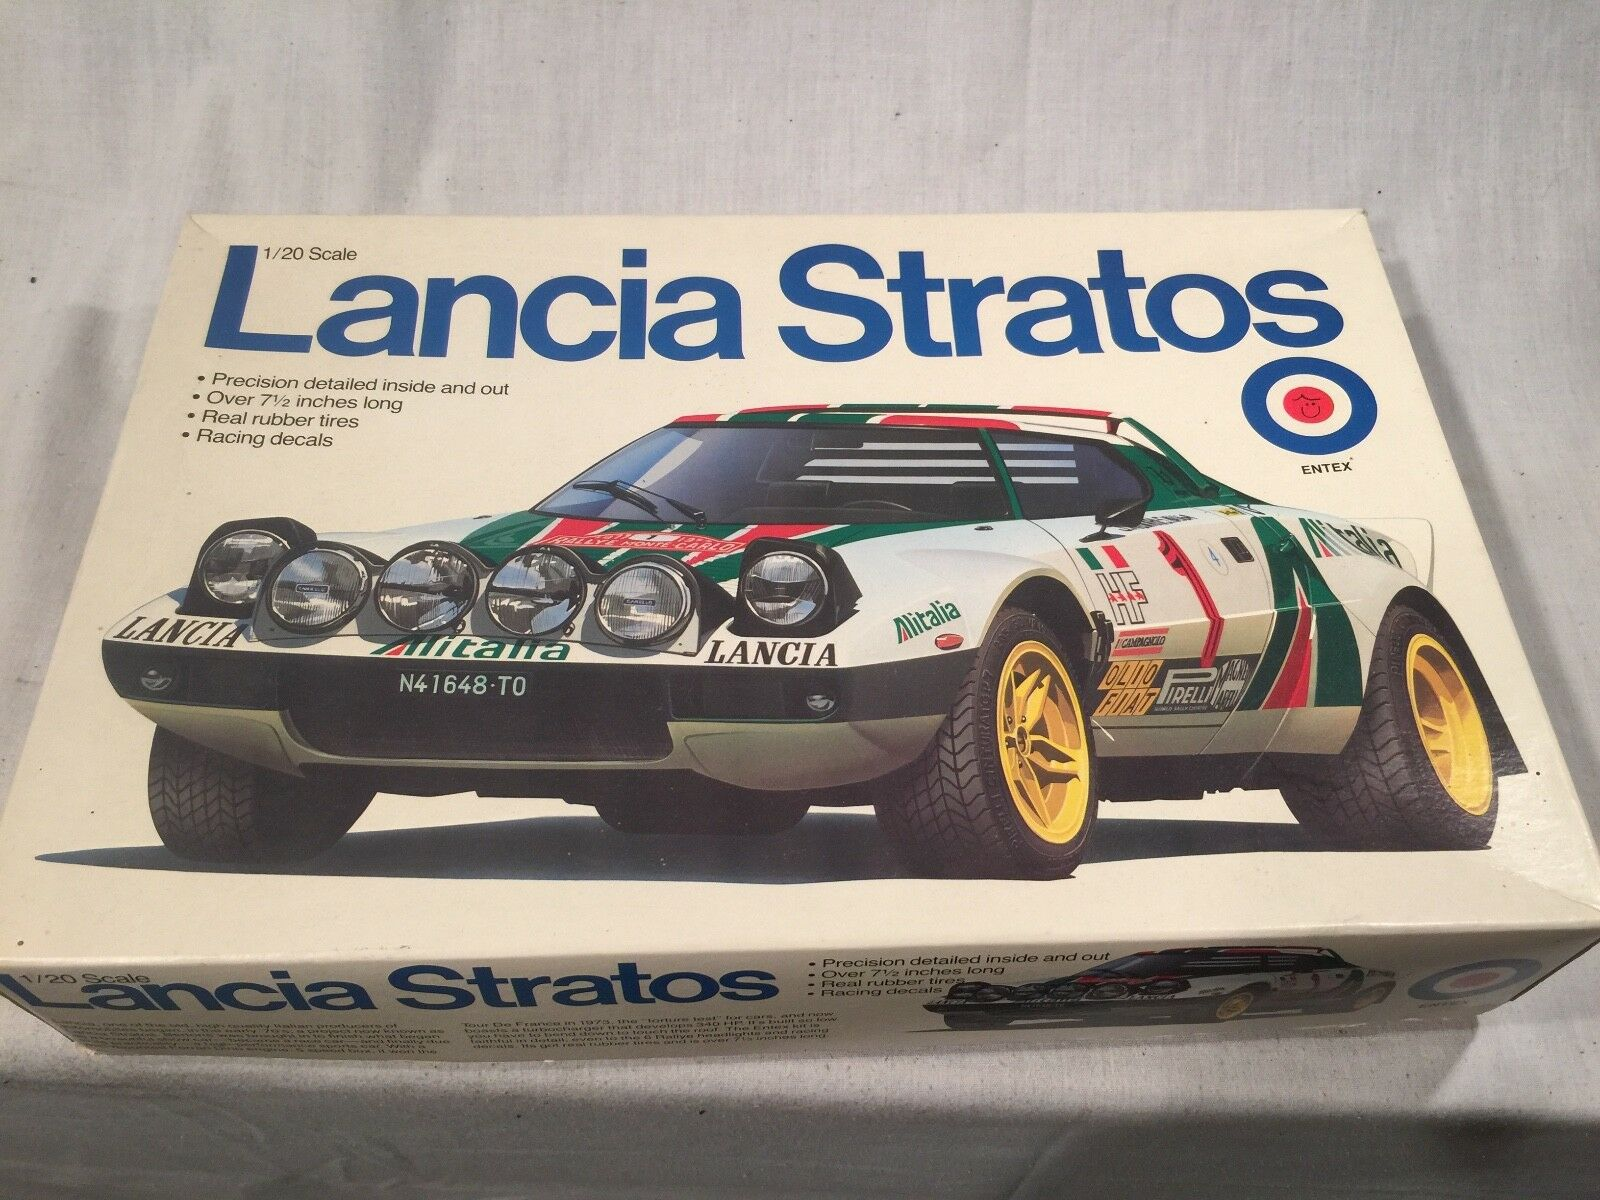 Lancia Stratos Monte Carlo Winner Entex Plastic Model Kit Sealed Bags 1 20 Scale